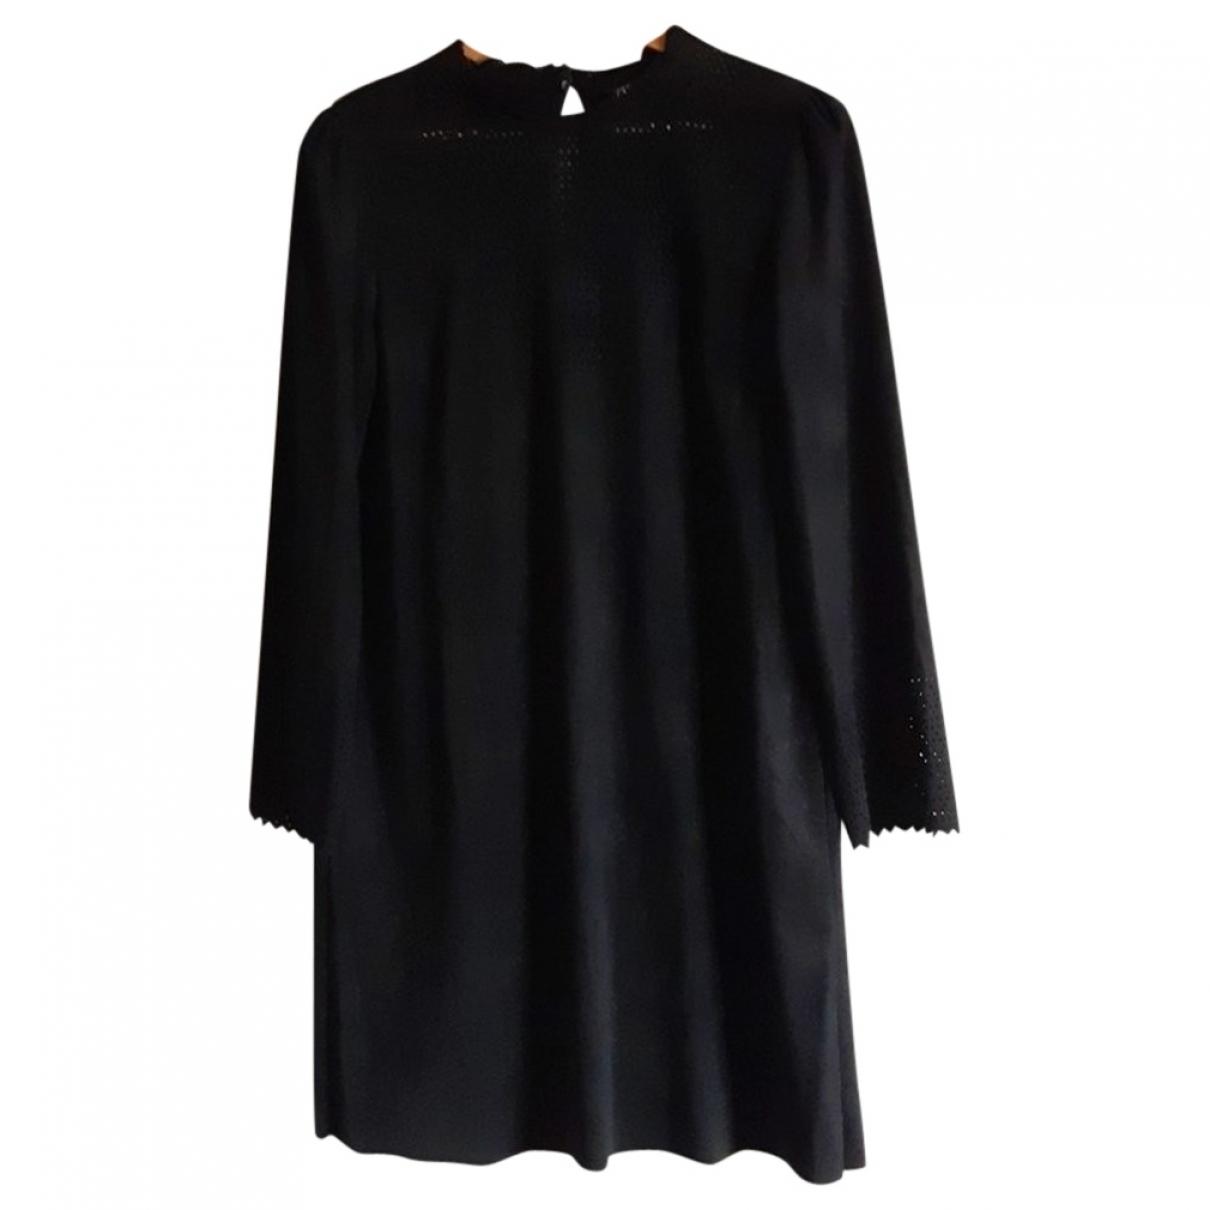 Zara - Robe   pour femme en suede - noir